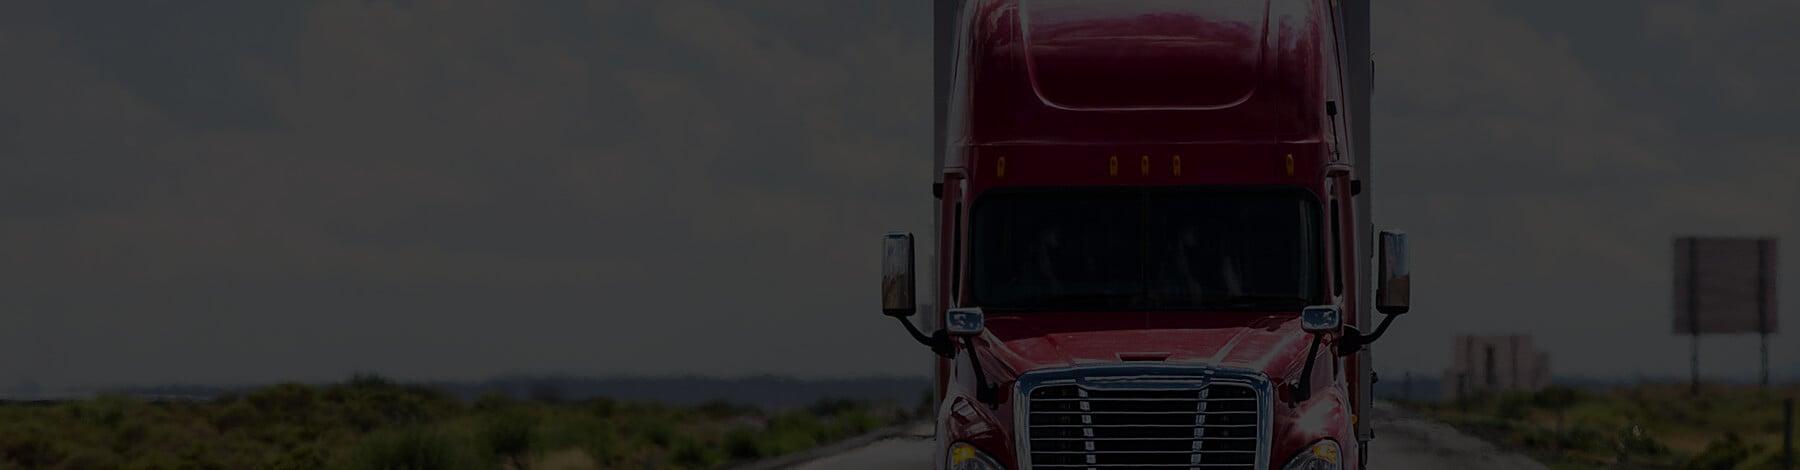 Akron-Medina Trucks